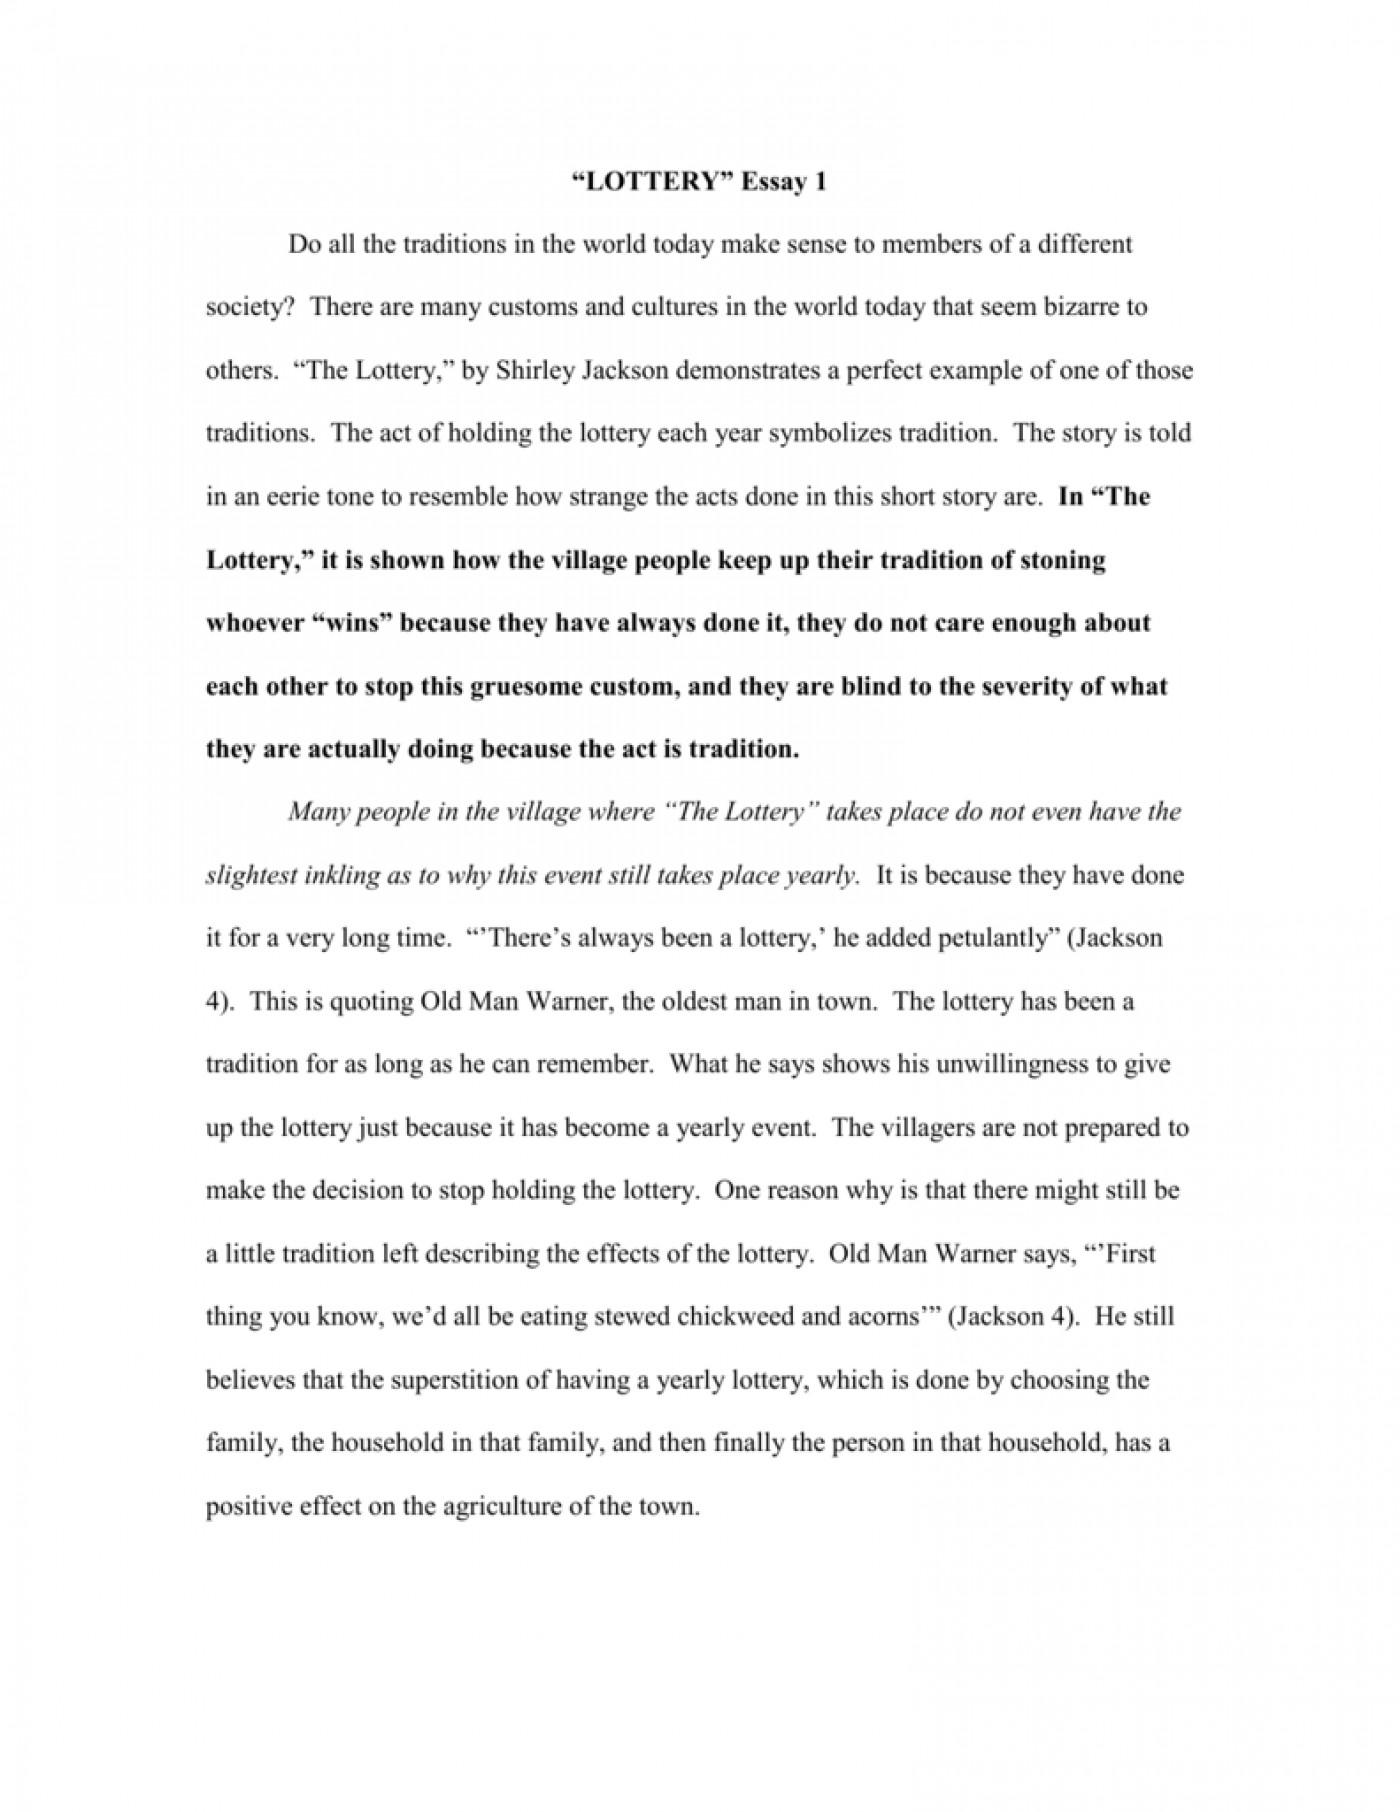 The lottery by shirley jackson essay essay